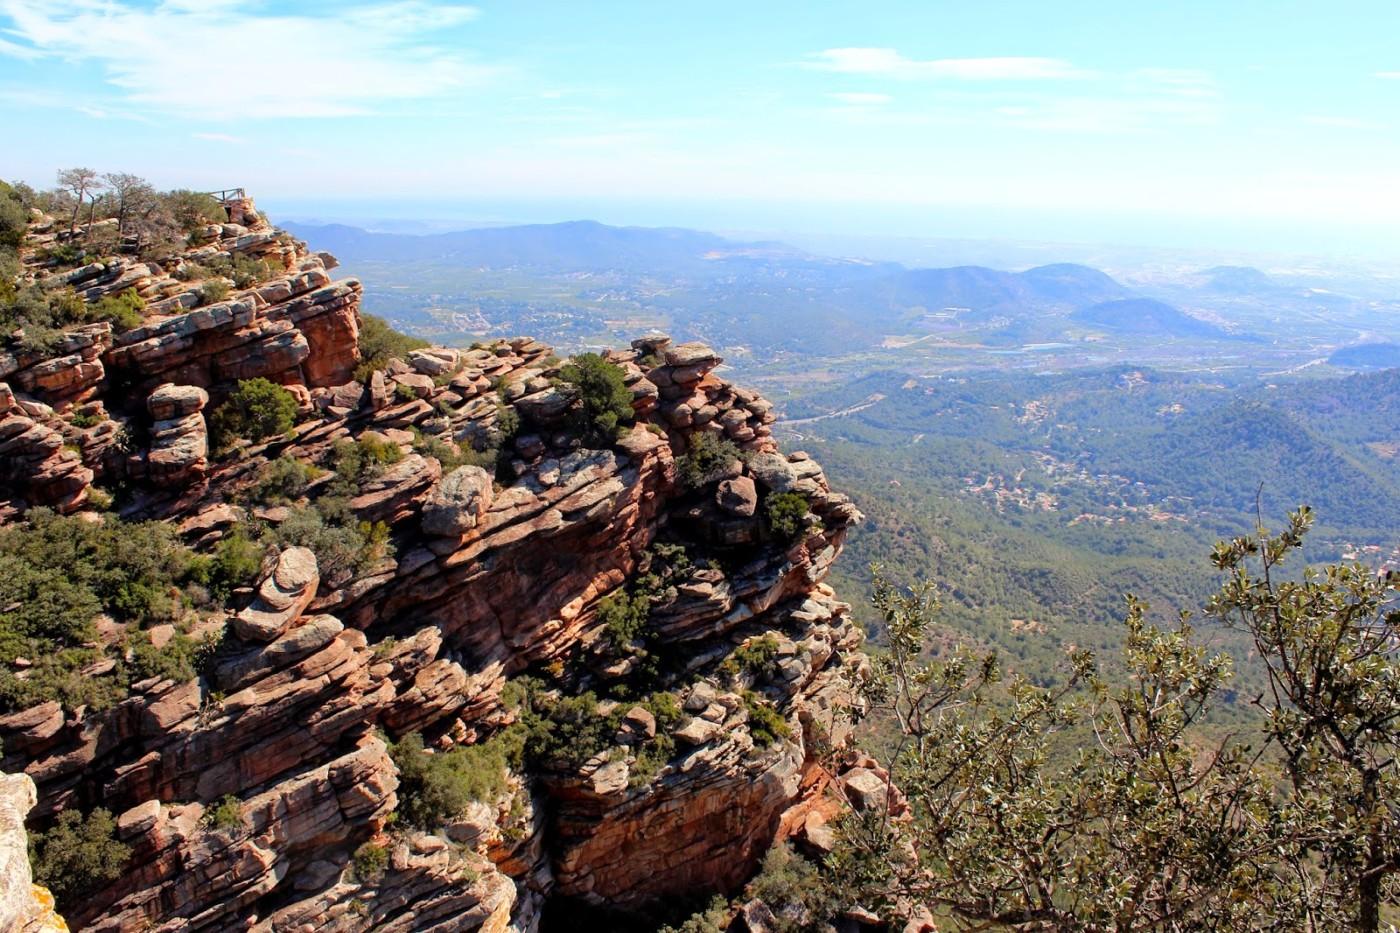 Parque Natural Sierra de Calderona Garbi